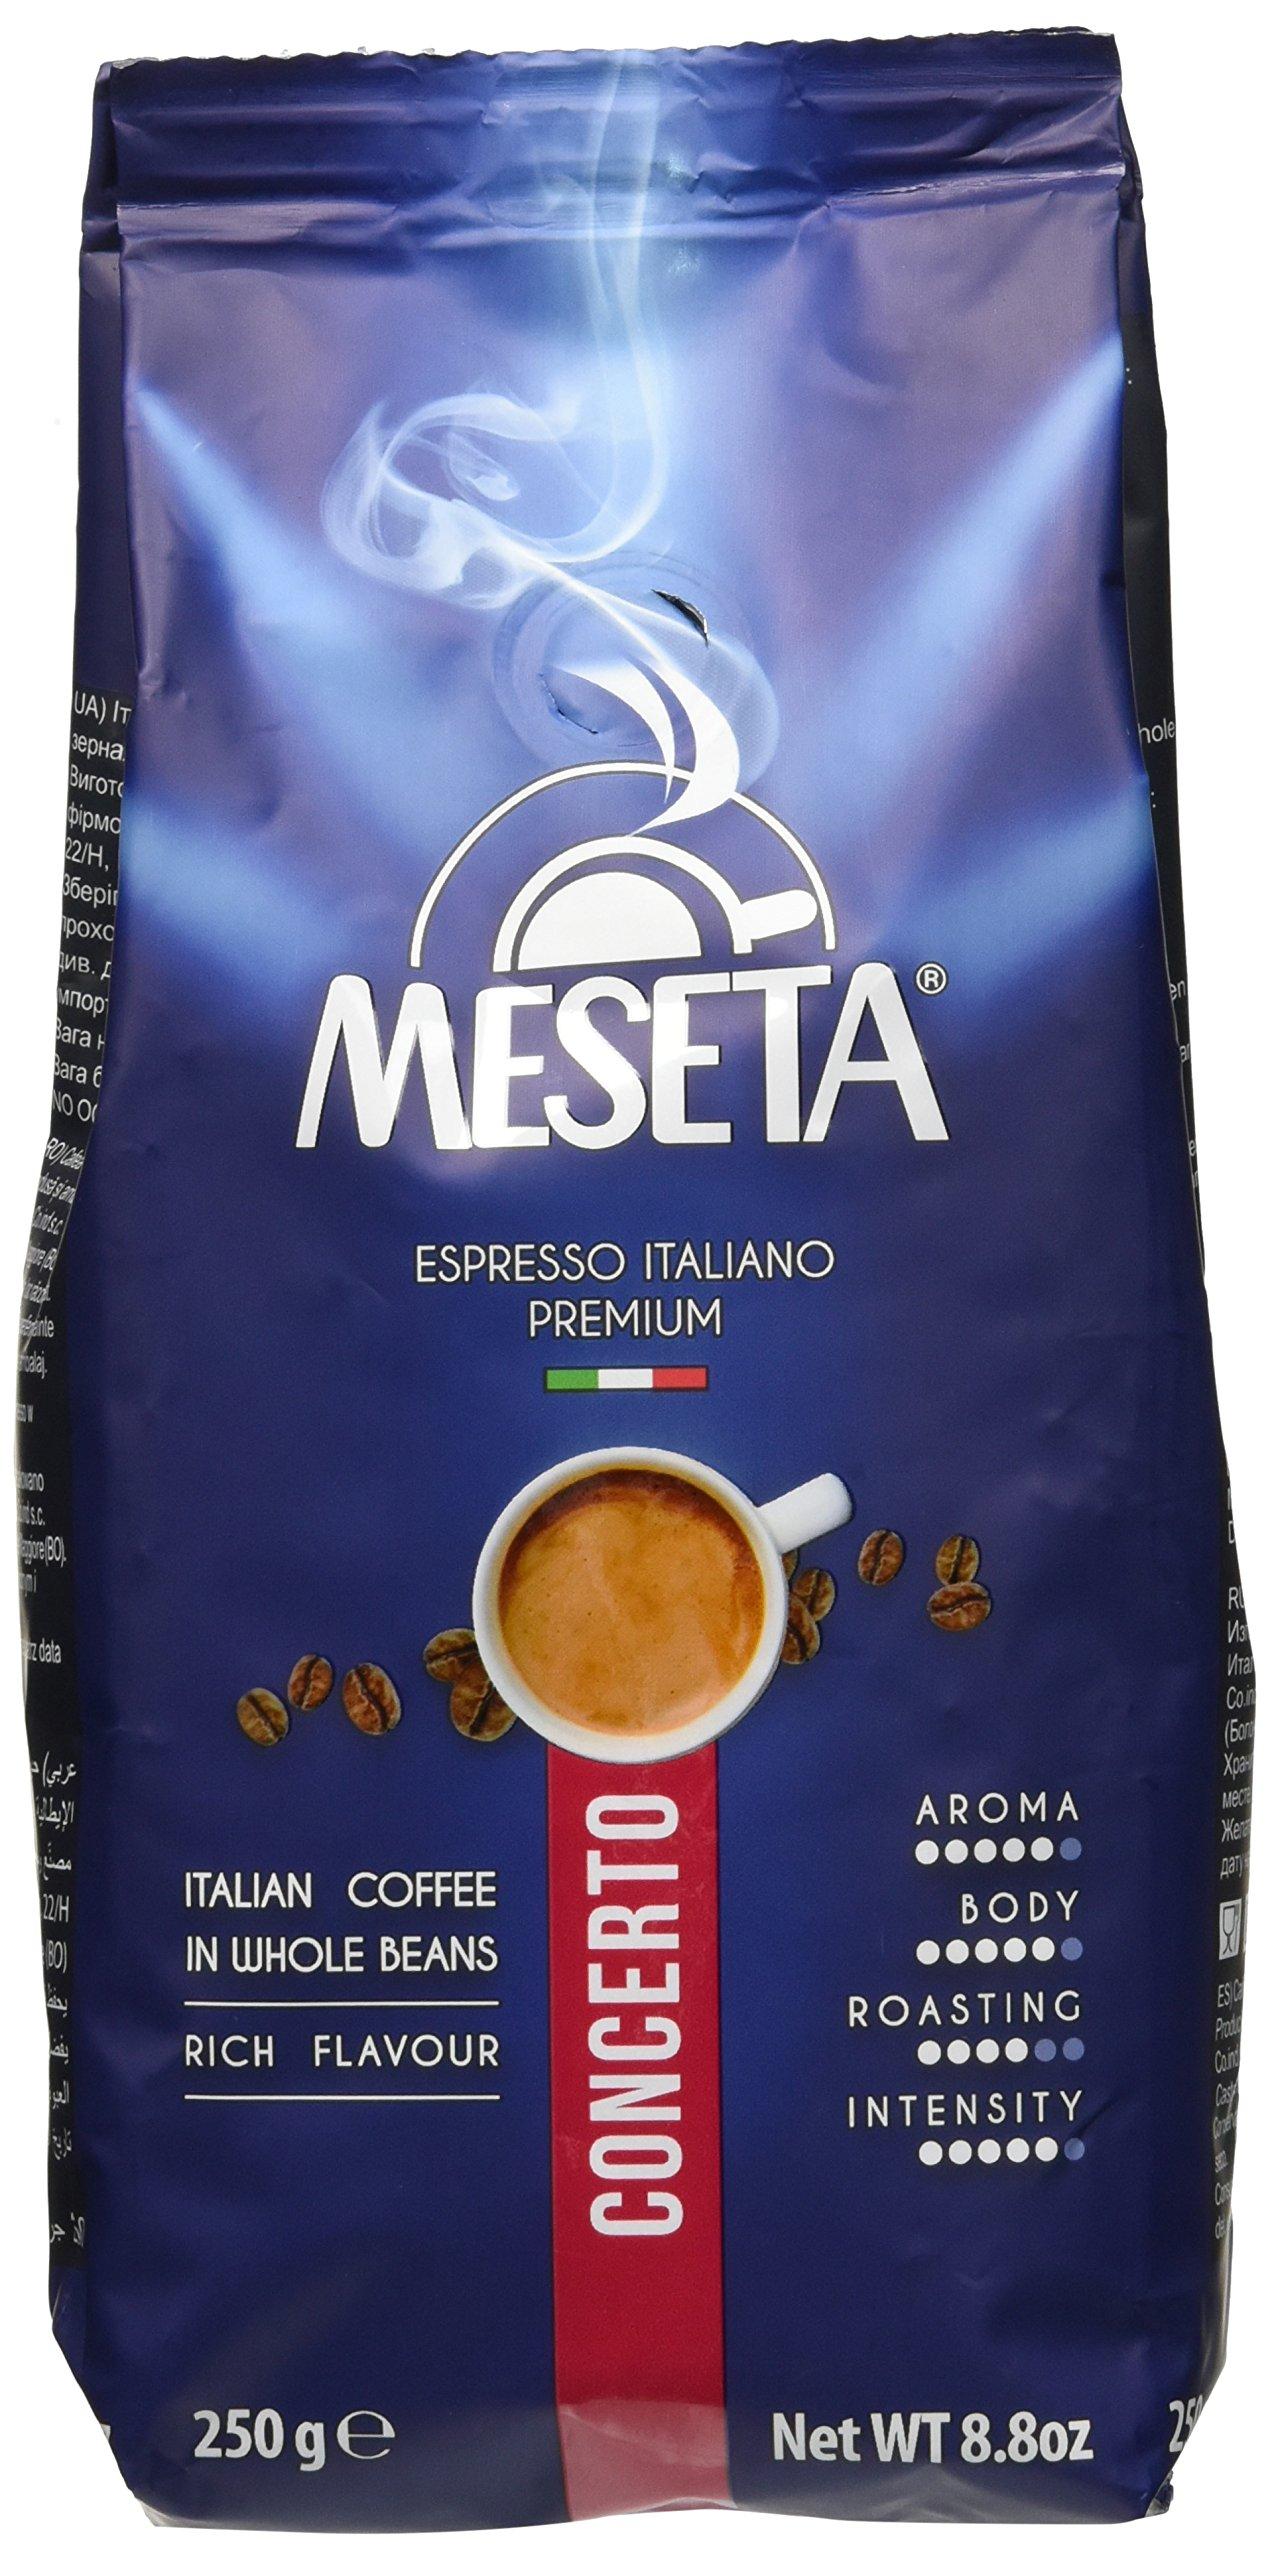 Caffè Meseta Caffè in Grani Concerto - Miscela Classico - 250 grammi 1 spesavip